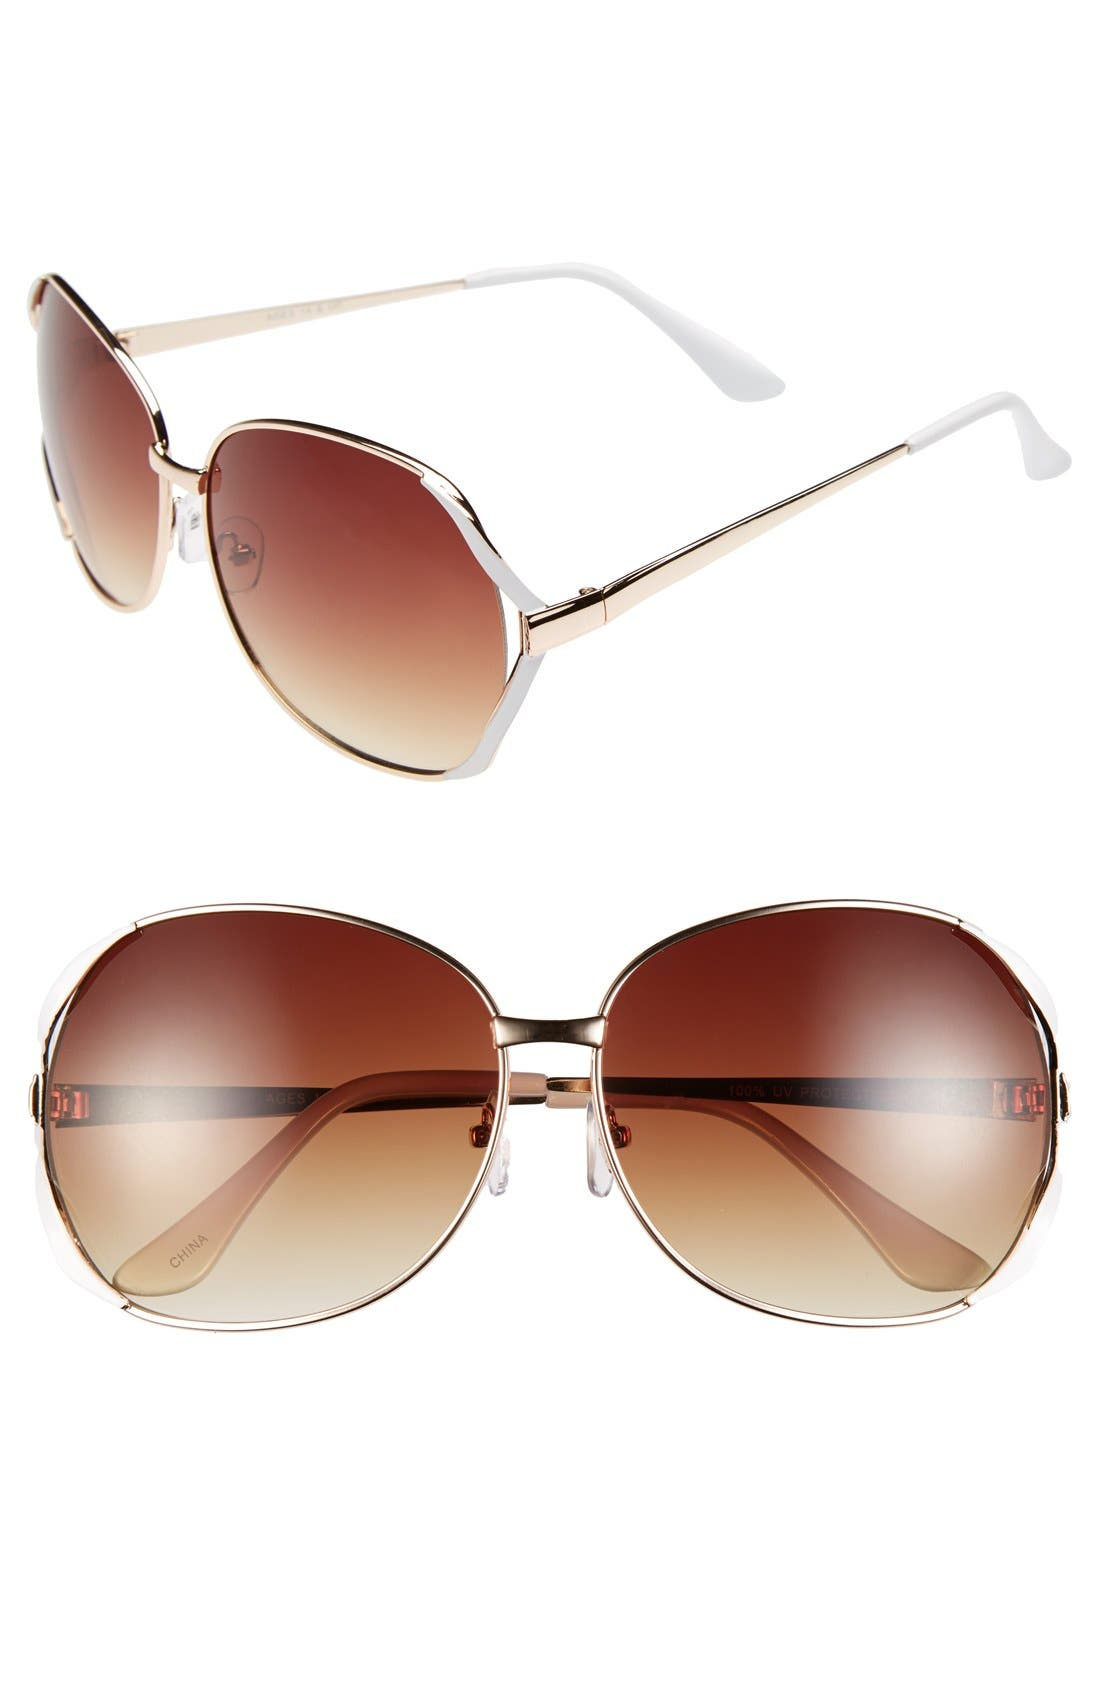 Main Image - Fantas Eyes 'San Juan' Aviator Sunglasses (Juniors)